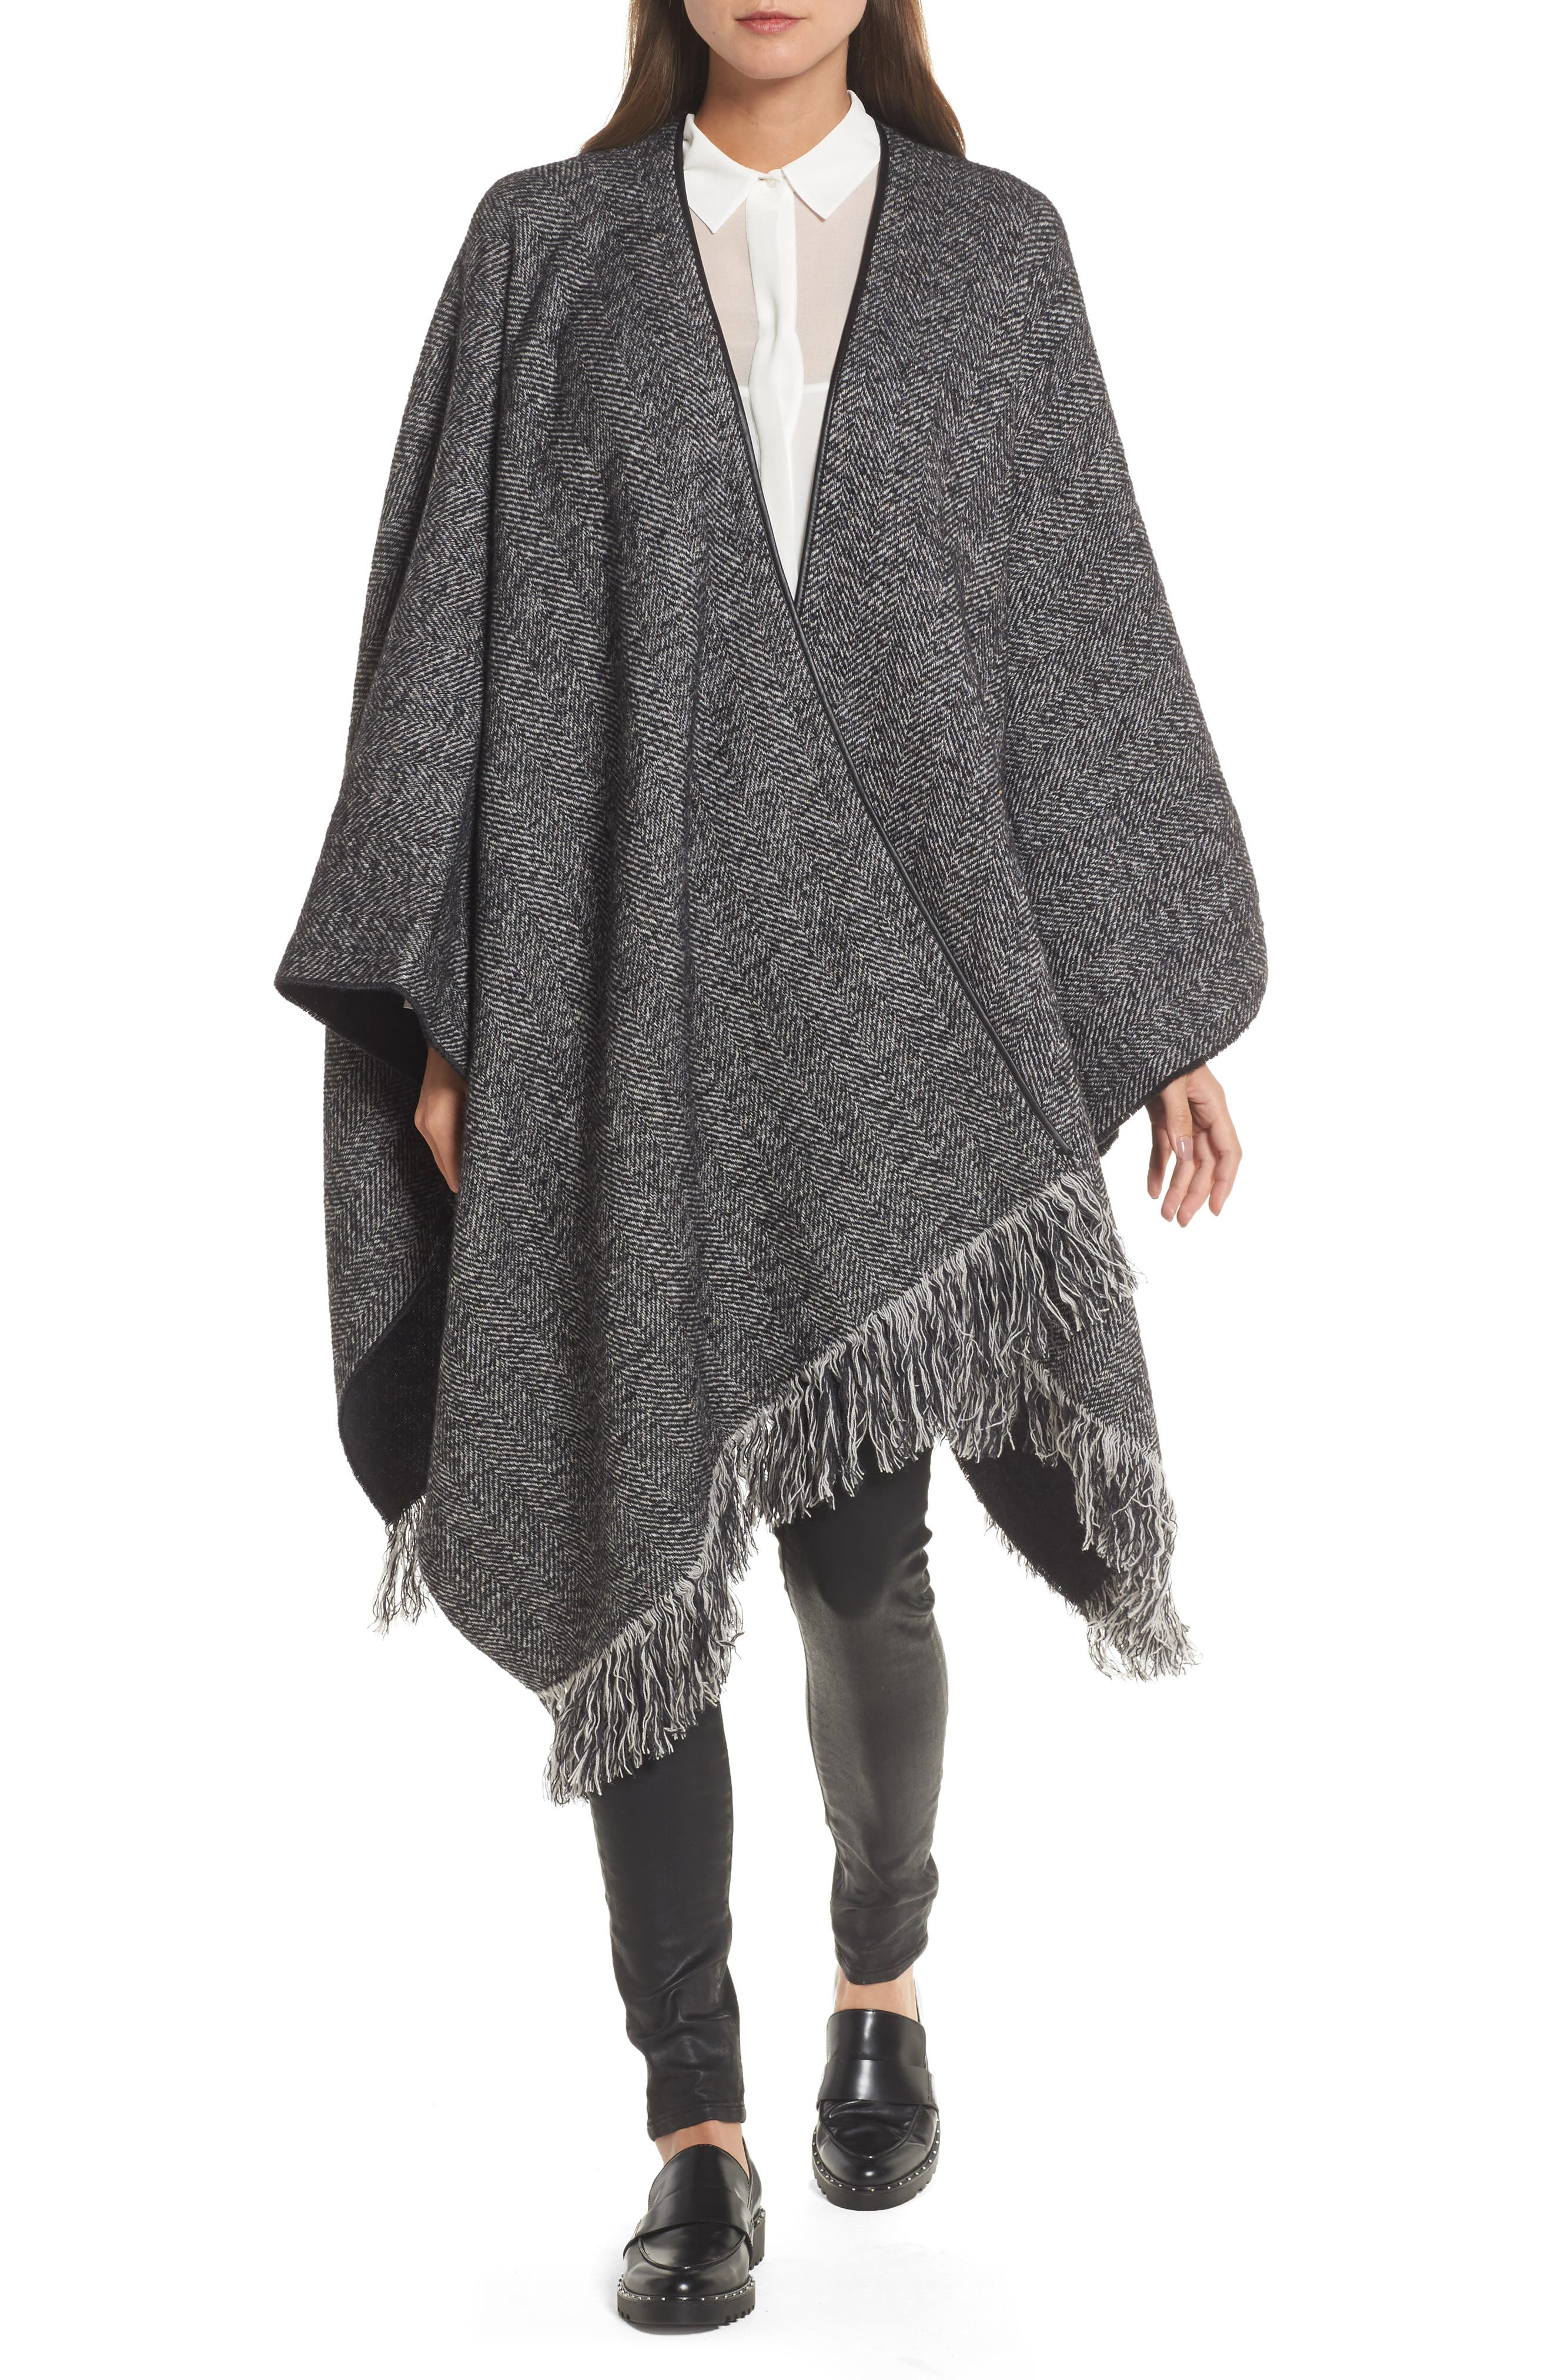 Alternate Image 1 Selected - Max Mara Herringbone Cashmere & Wool Cape